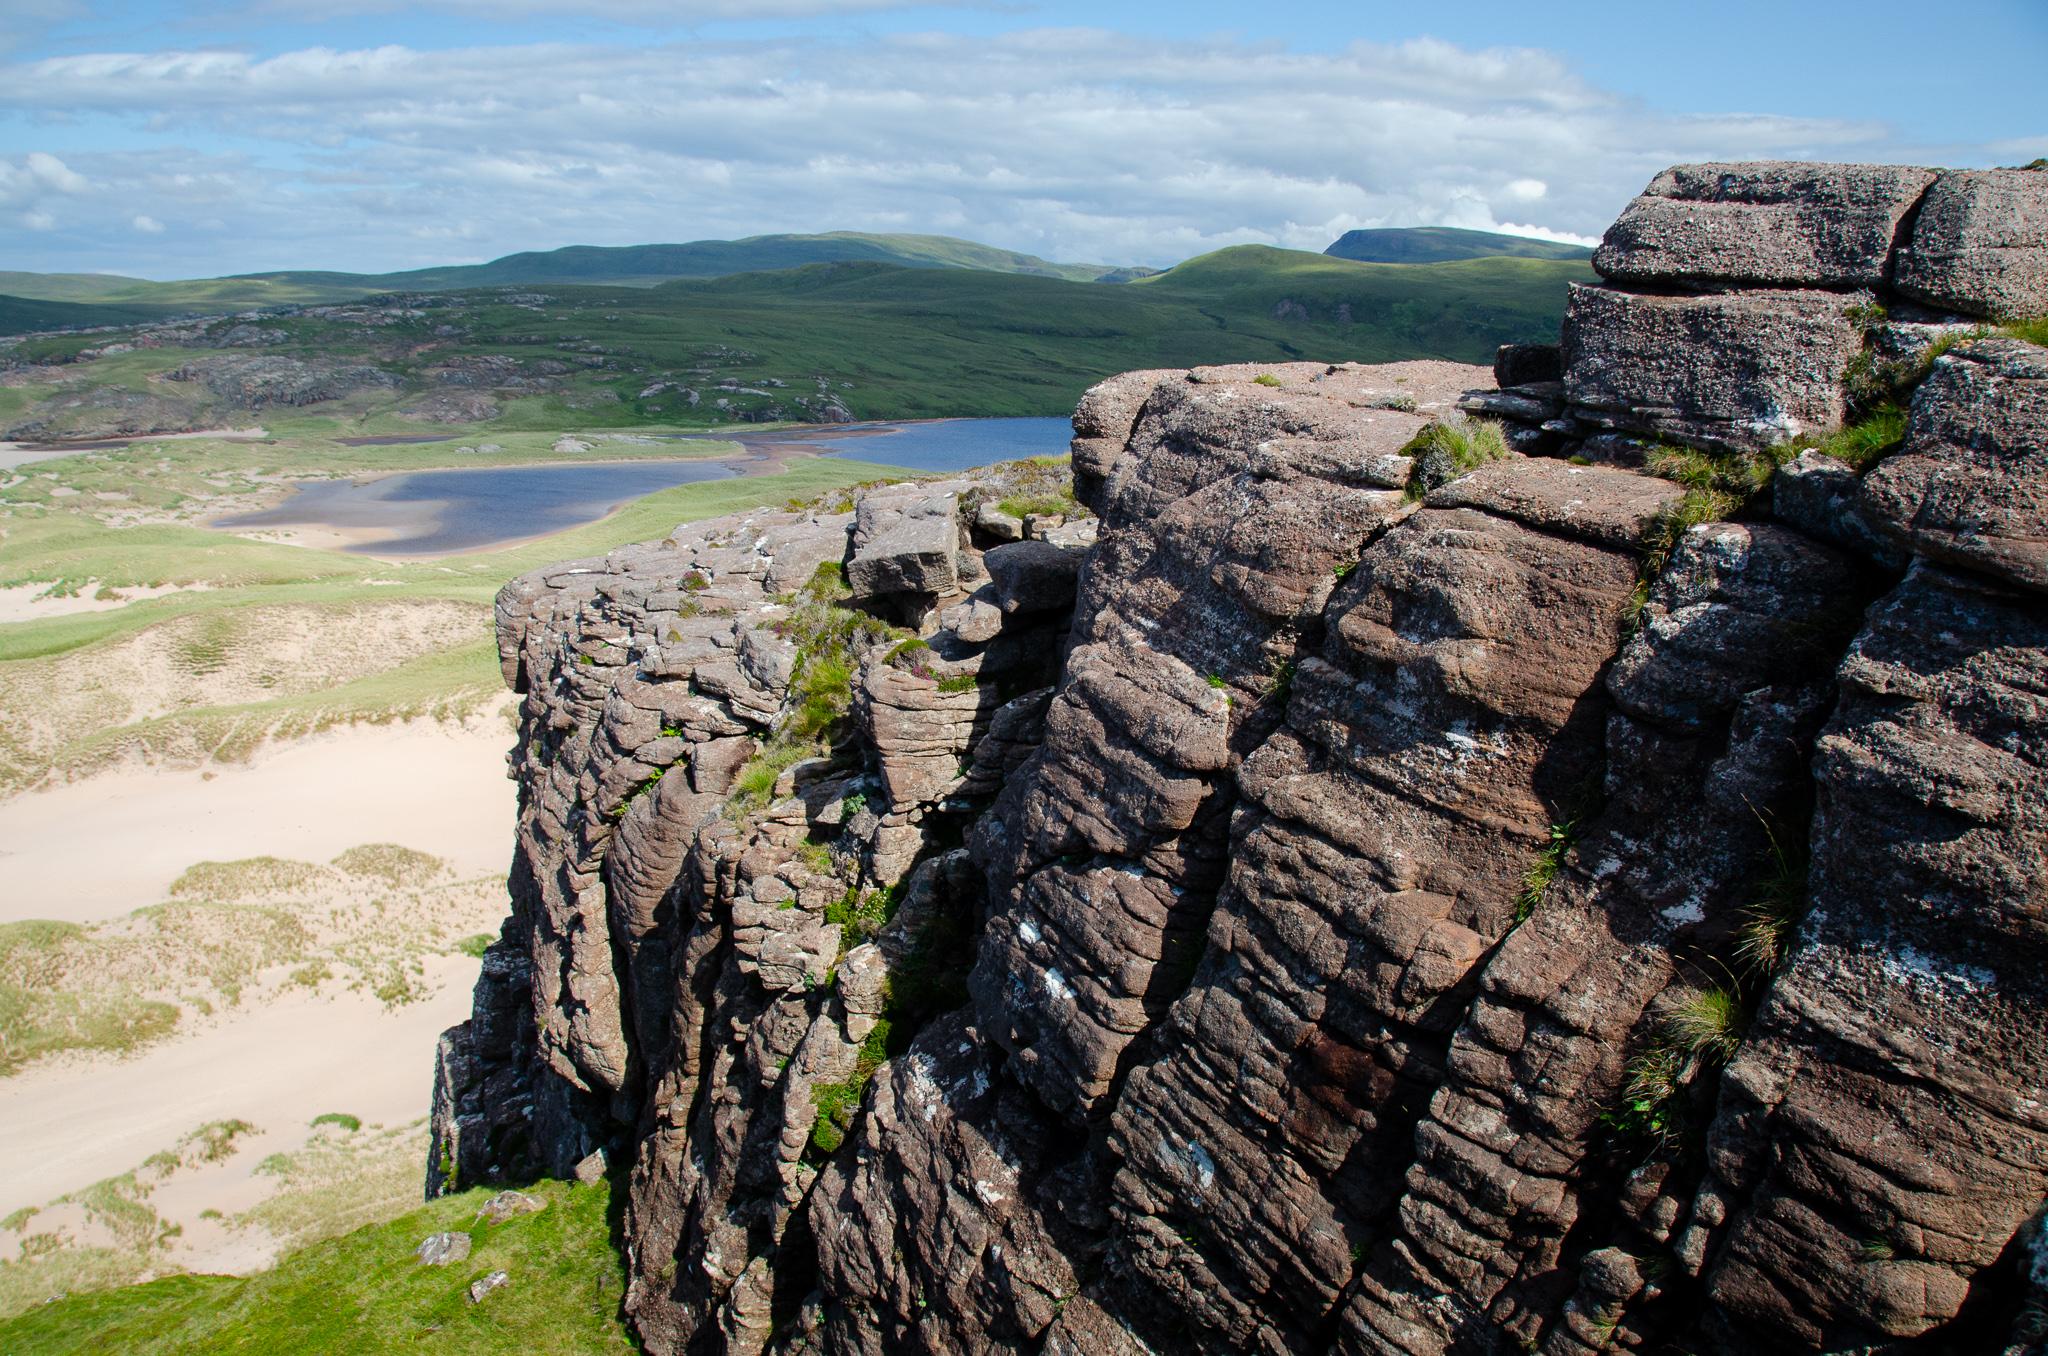 the rocky ledge overlooking Sandwood Bay dunes